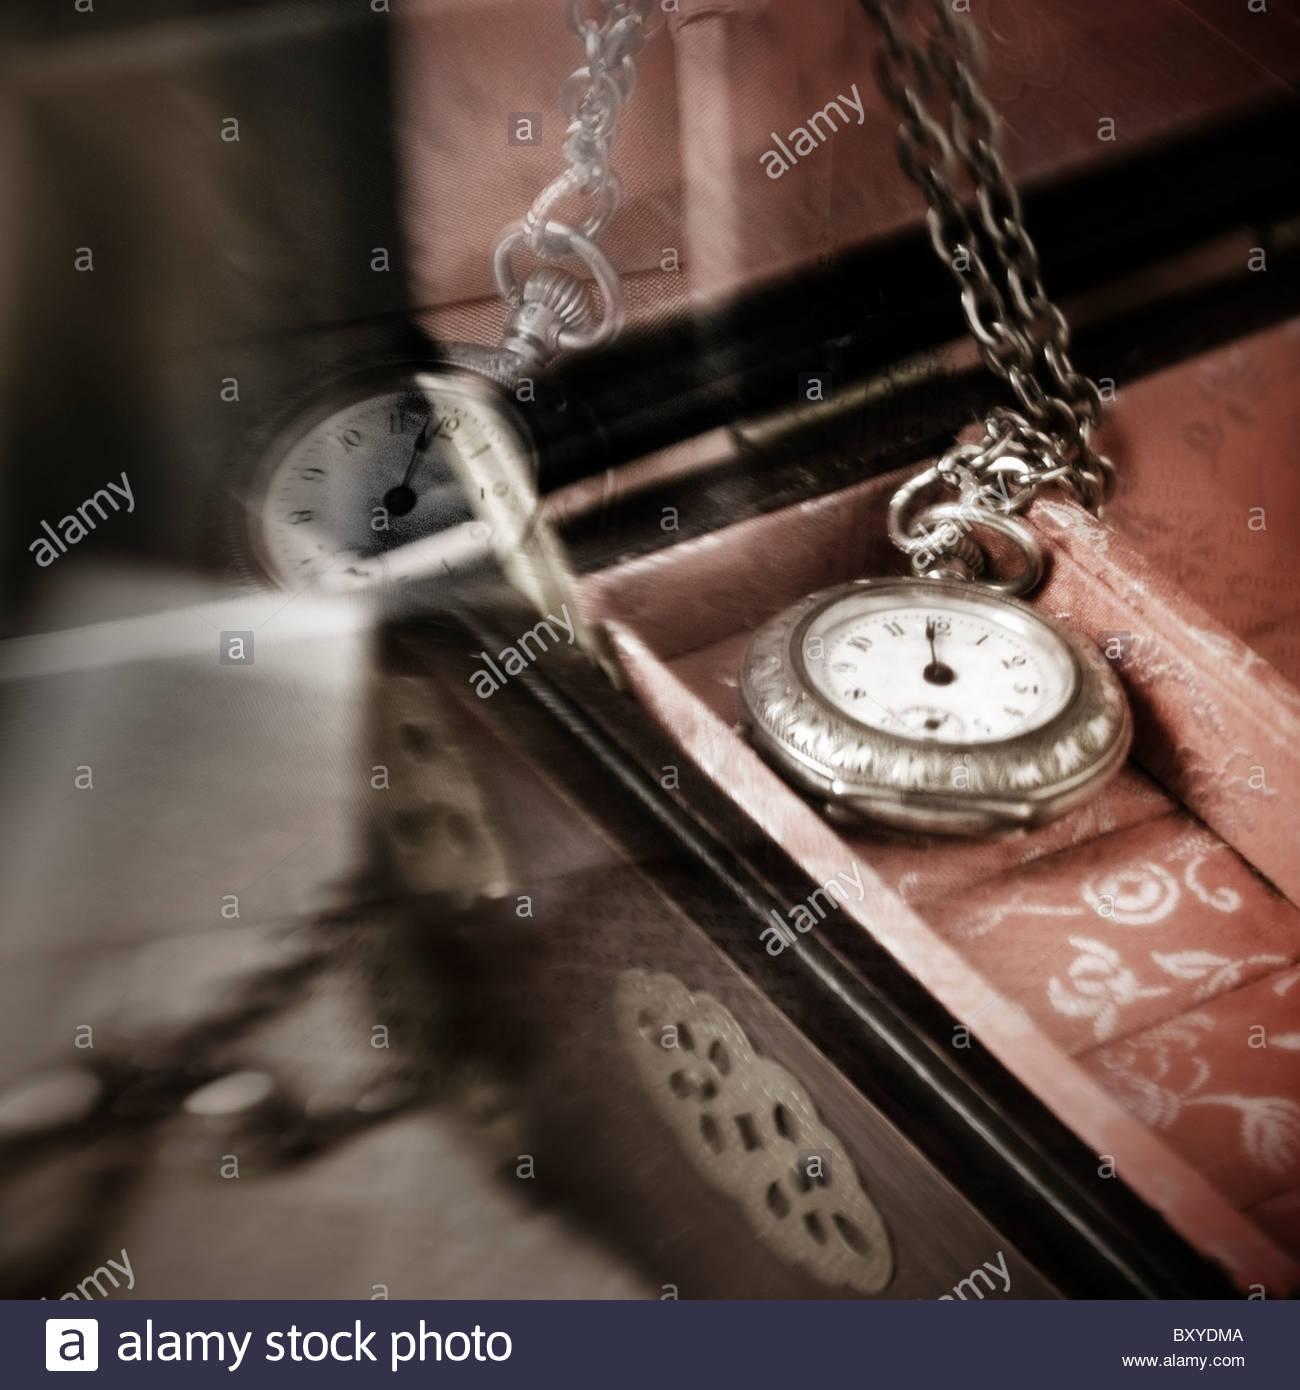 Ornamental timepiece in jewelry box - Stock Image